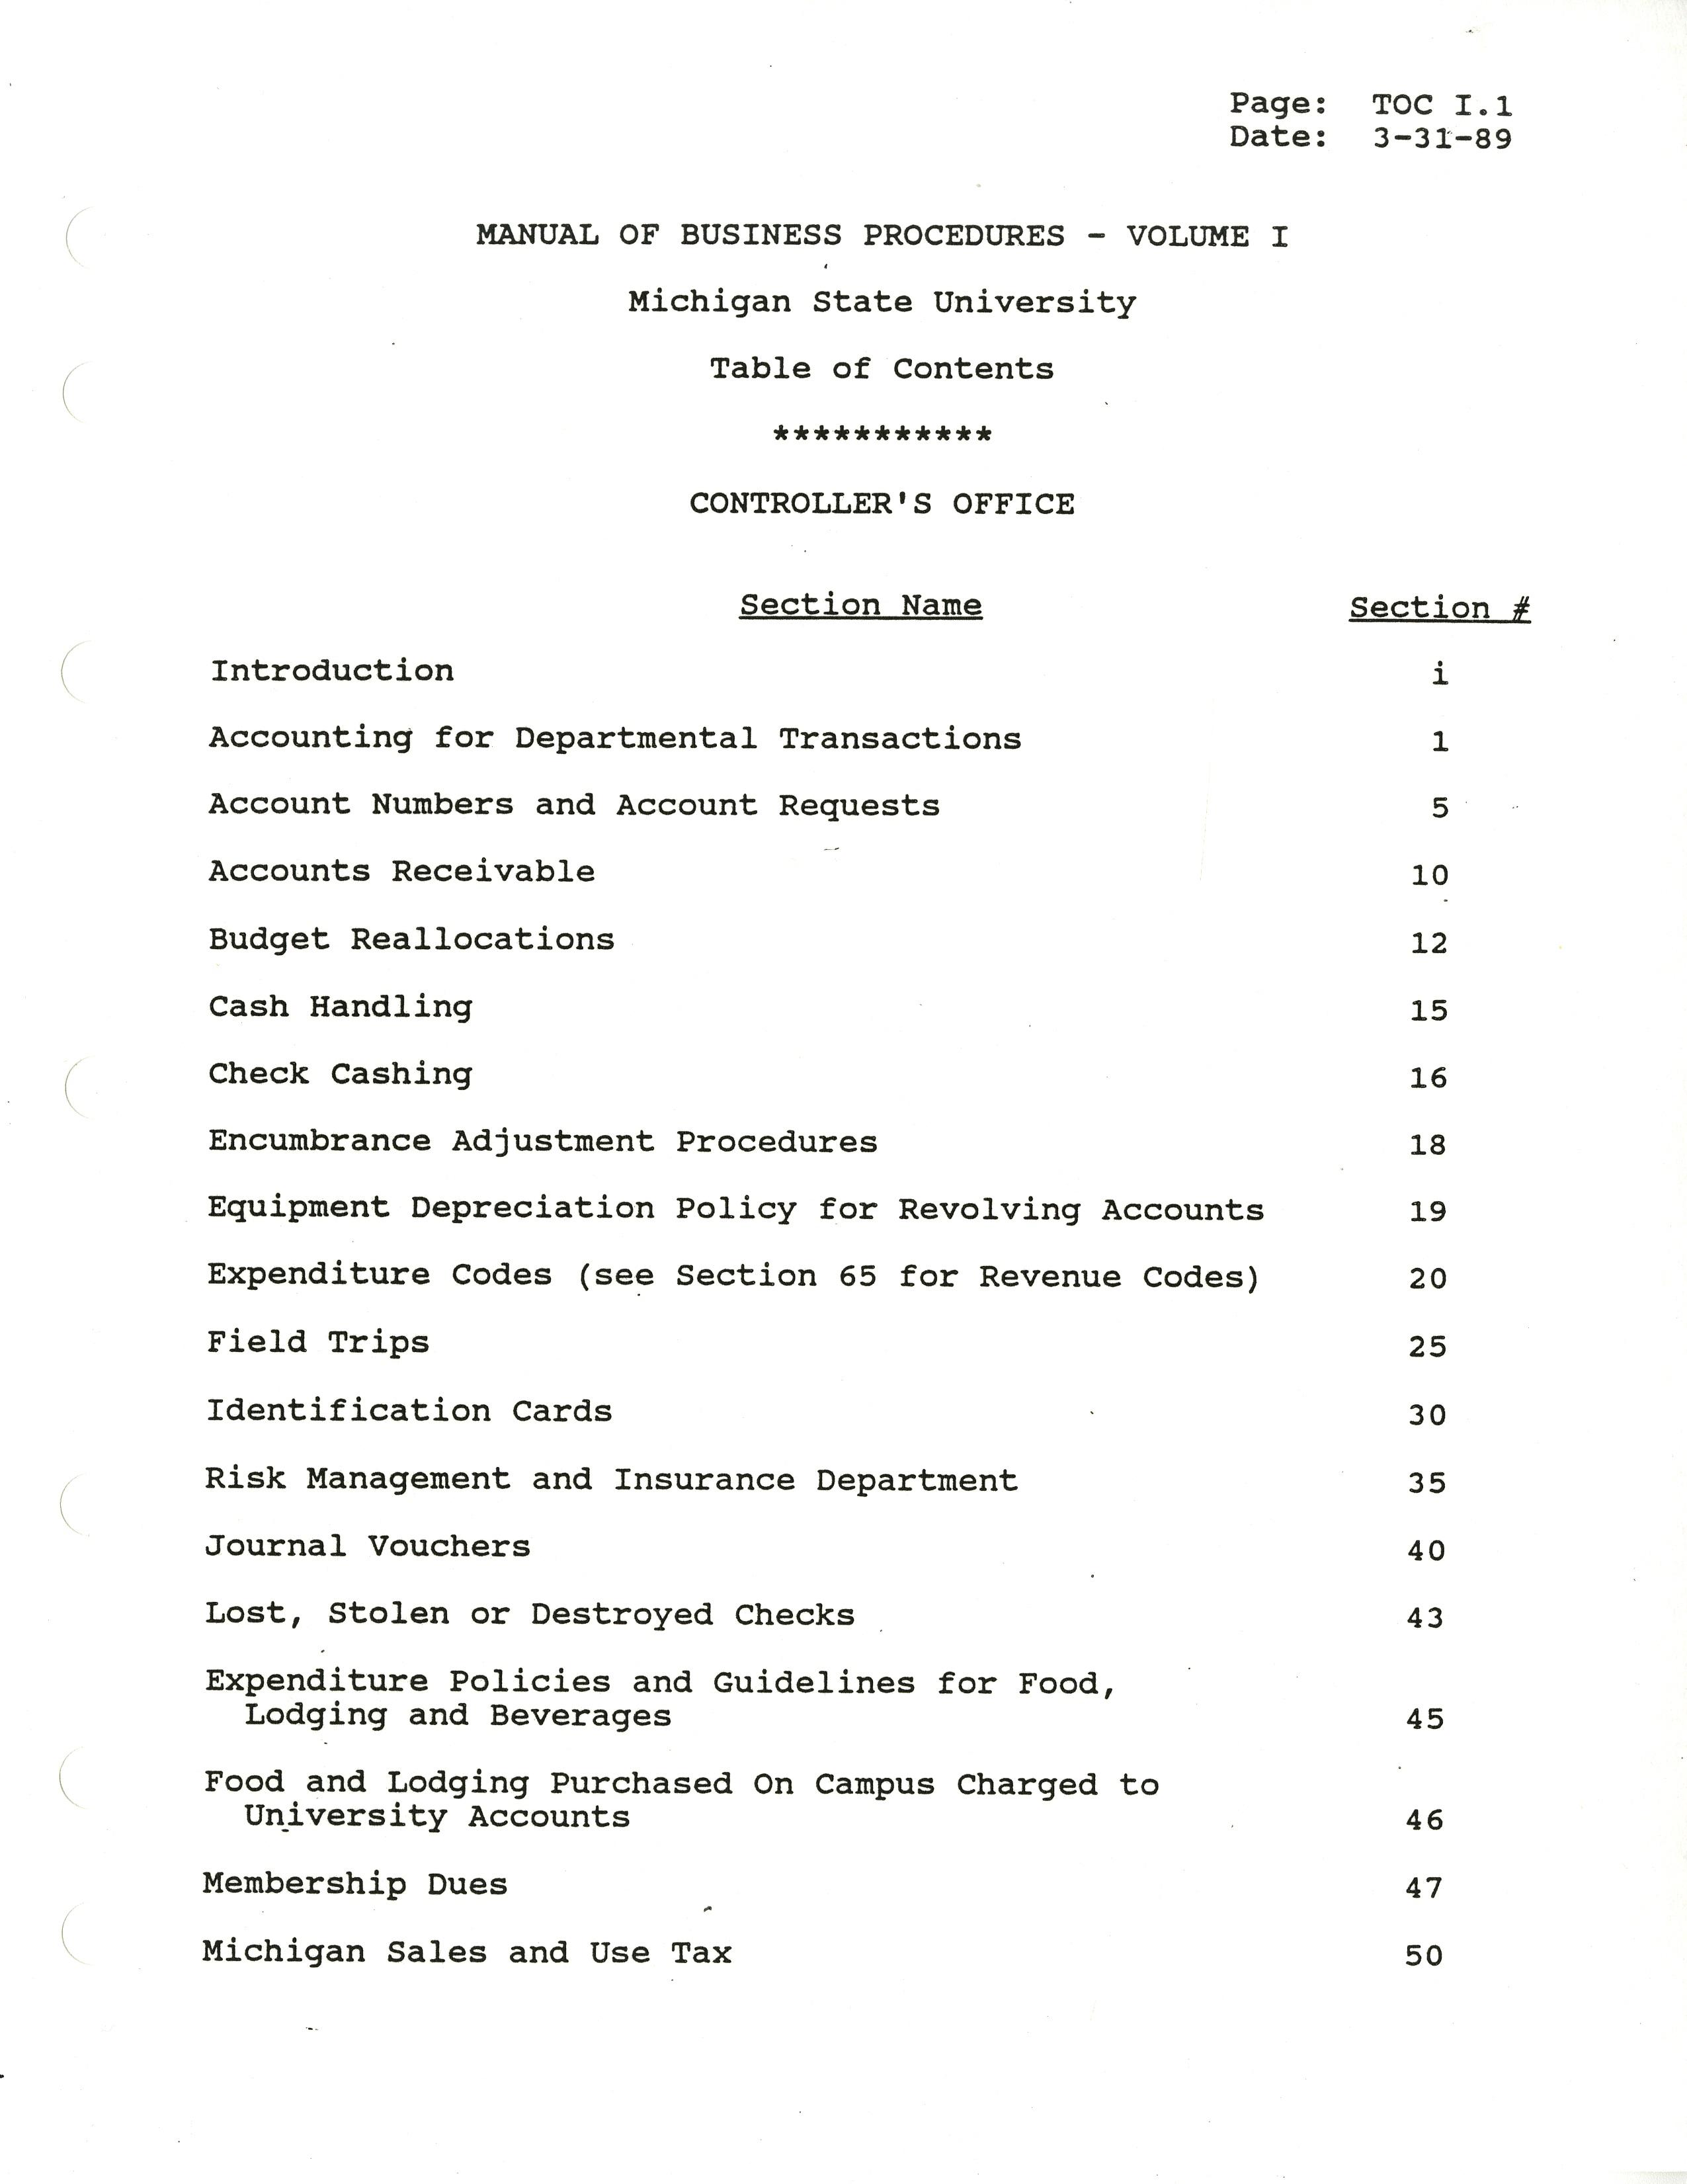 MSU Manual of Business Procedures, 1989